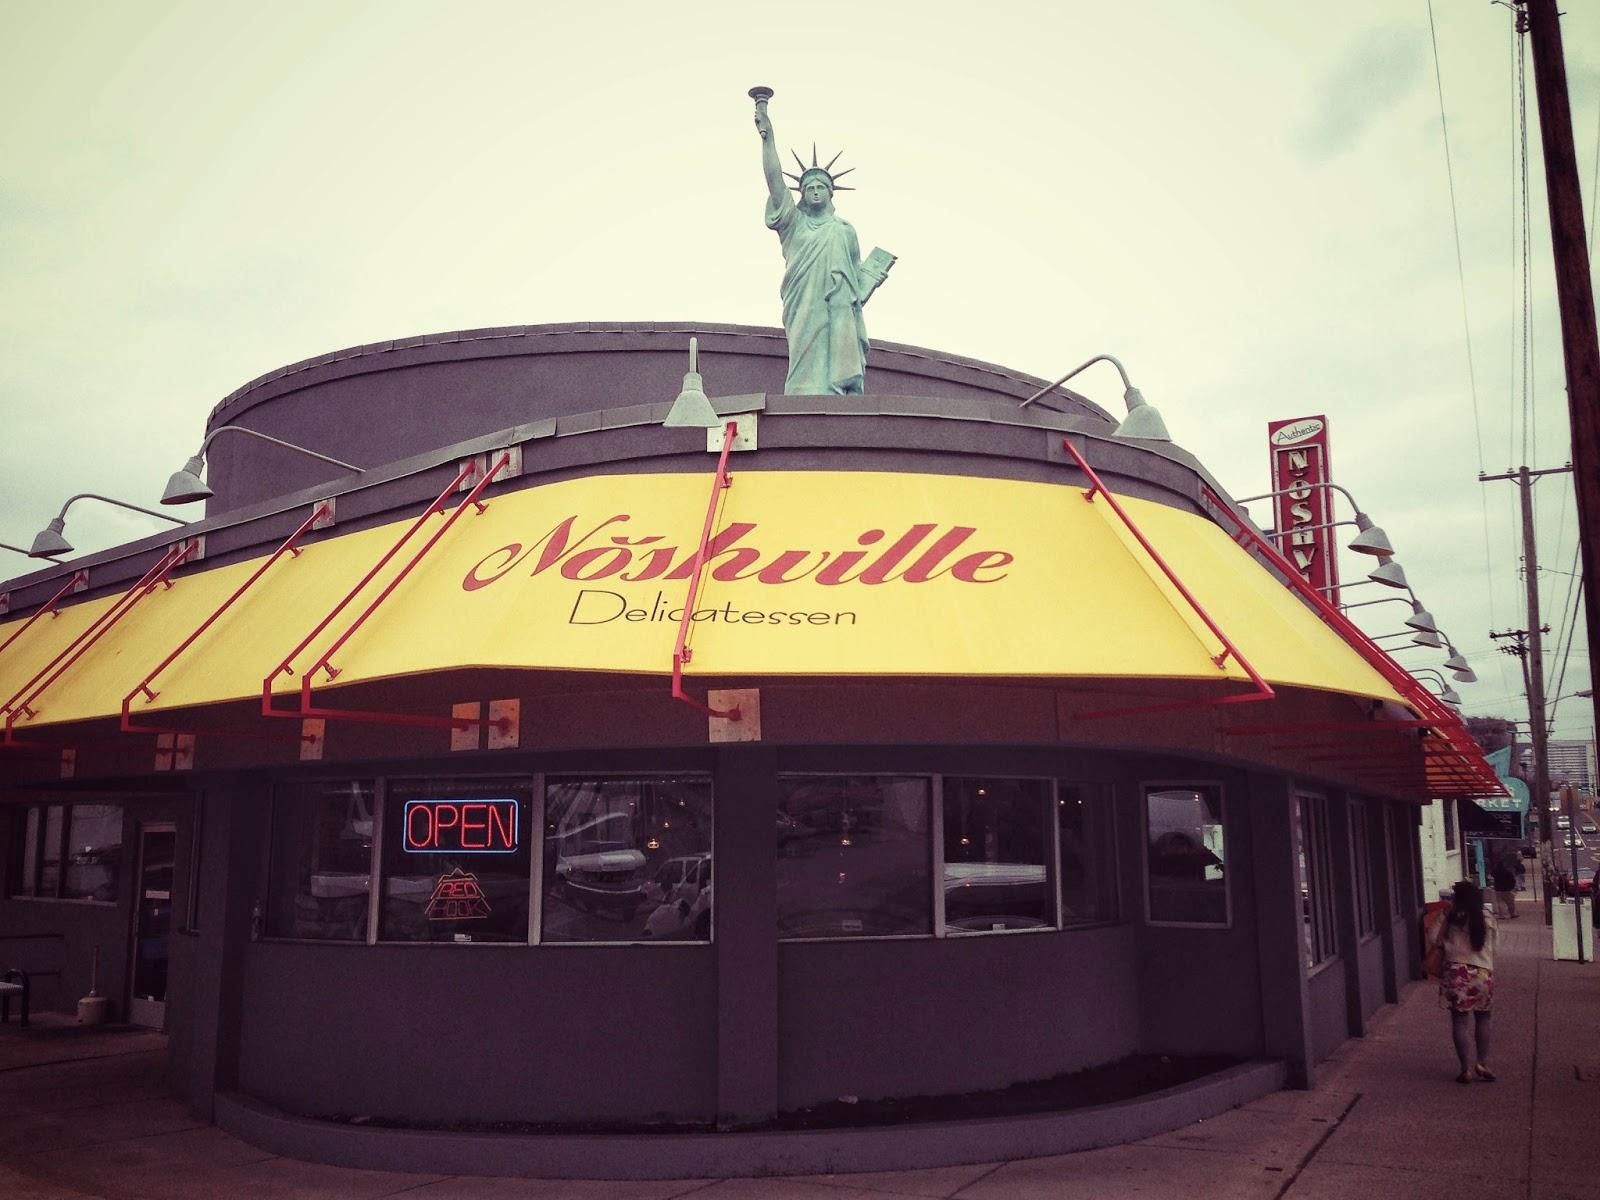 Noshville Delicatessen located in Nashville Tennessee